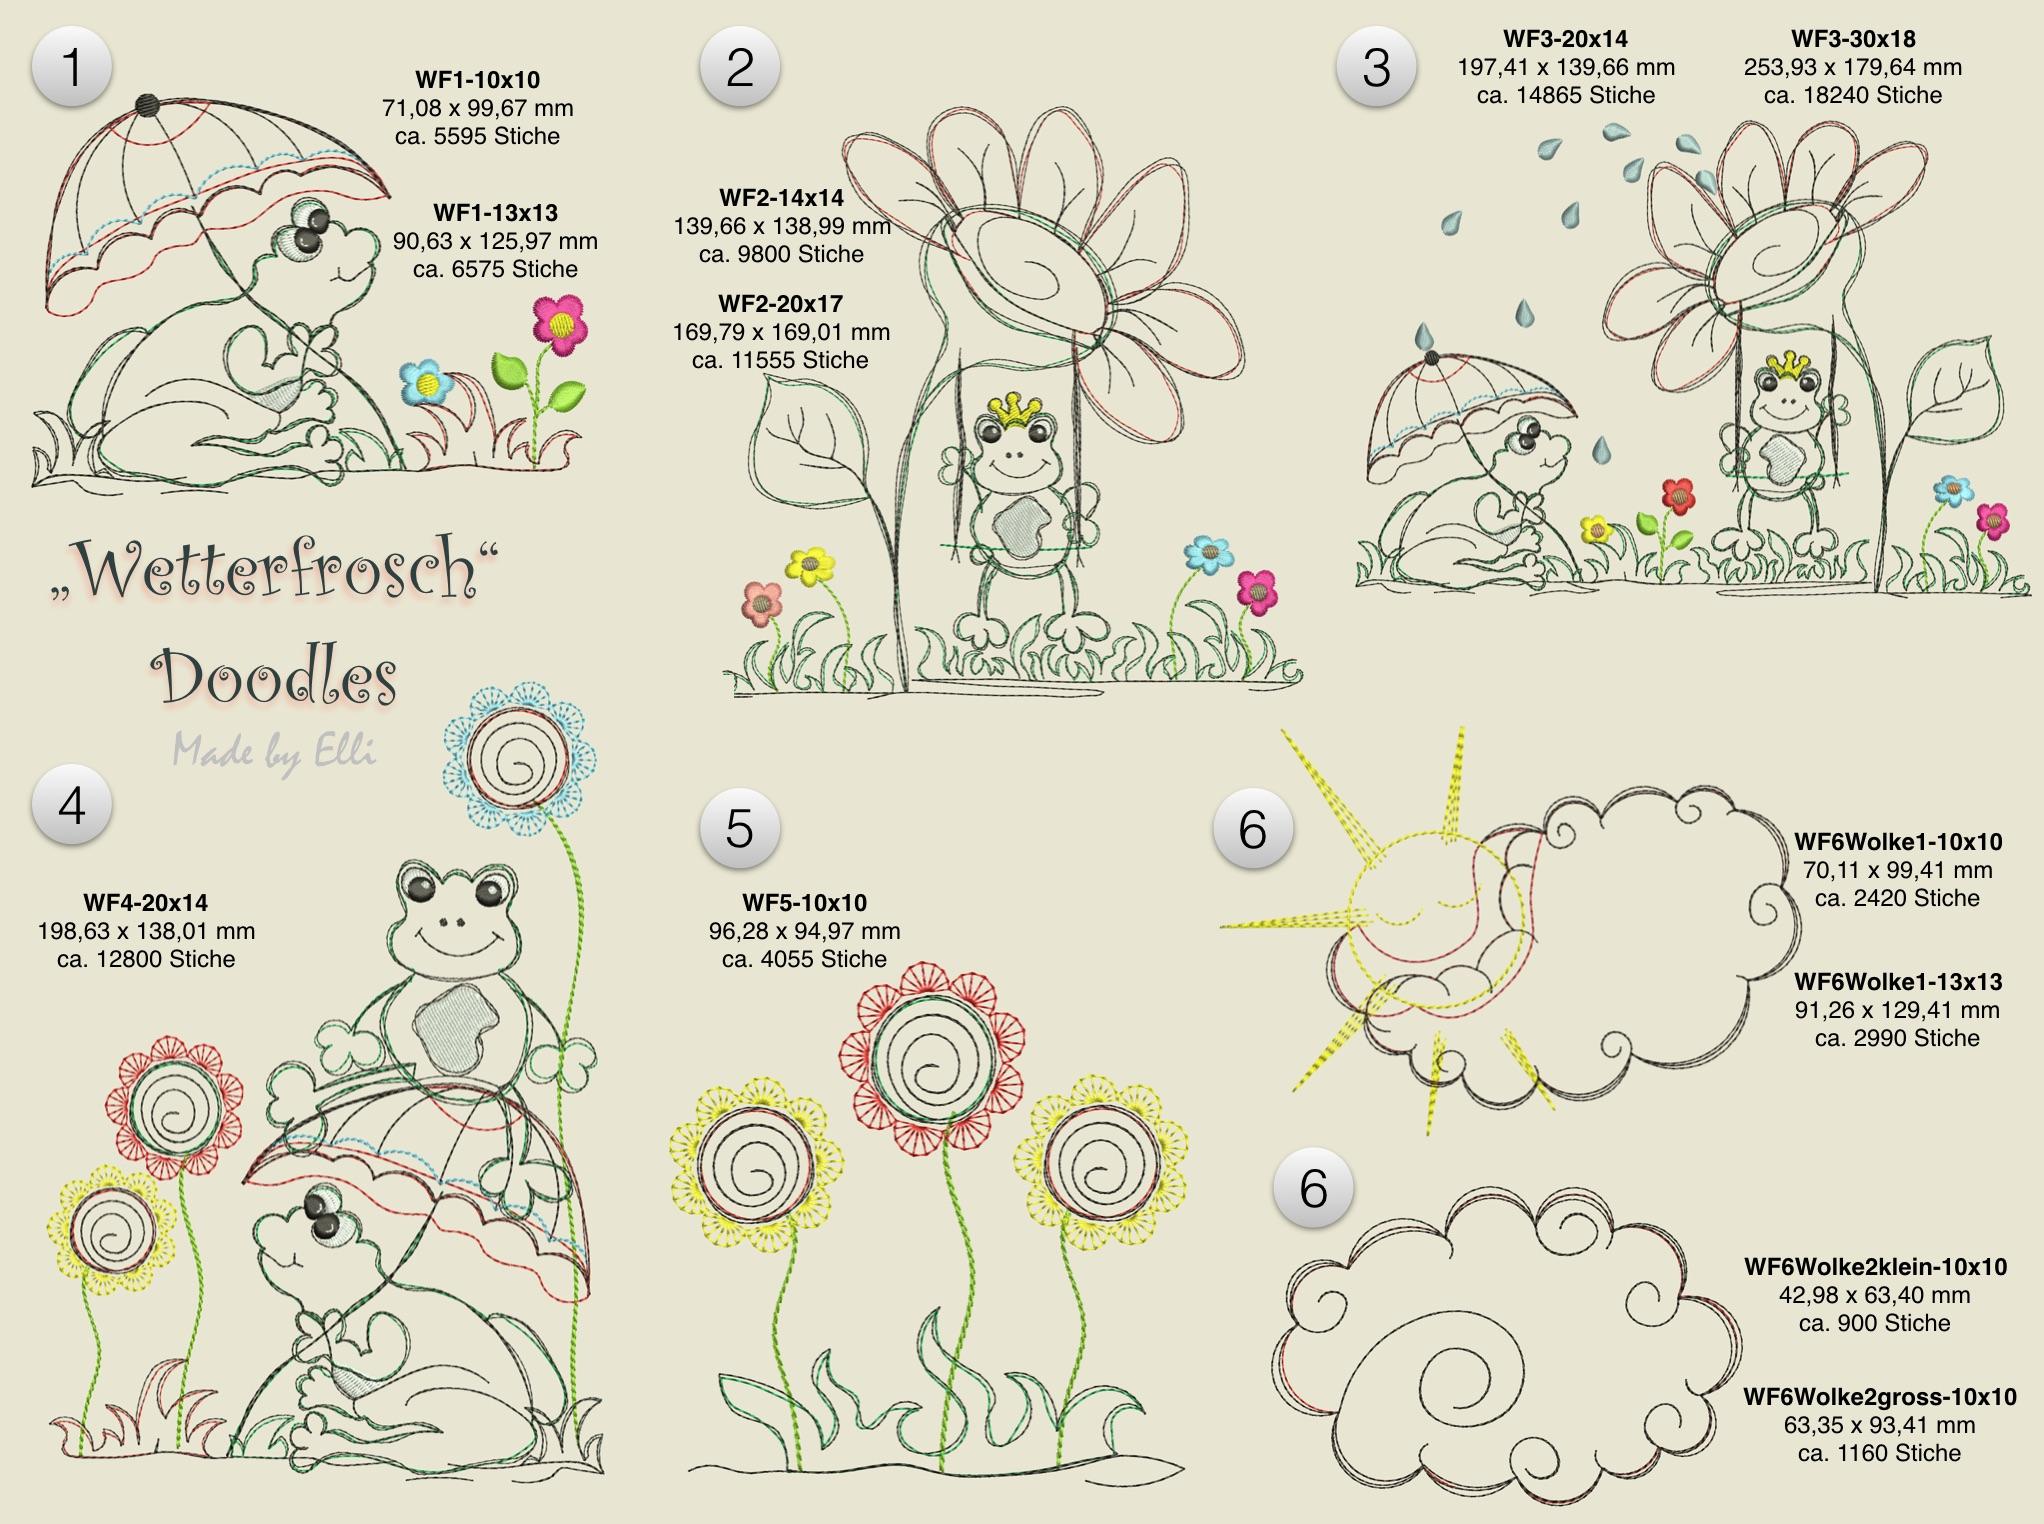 Dateimaße Wetterfrosch Doodles